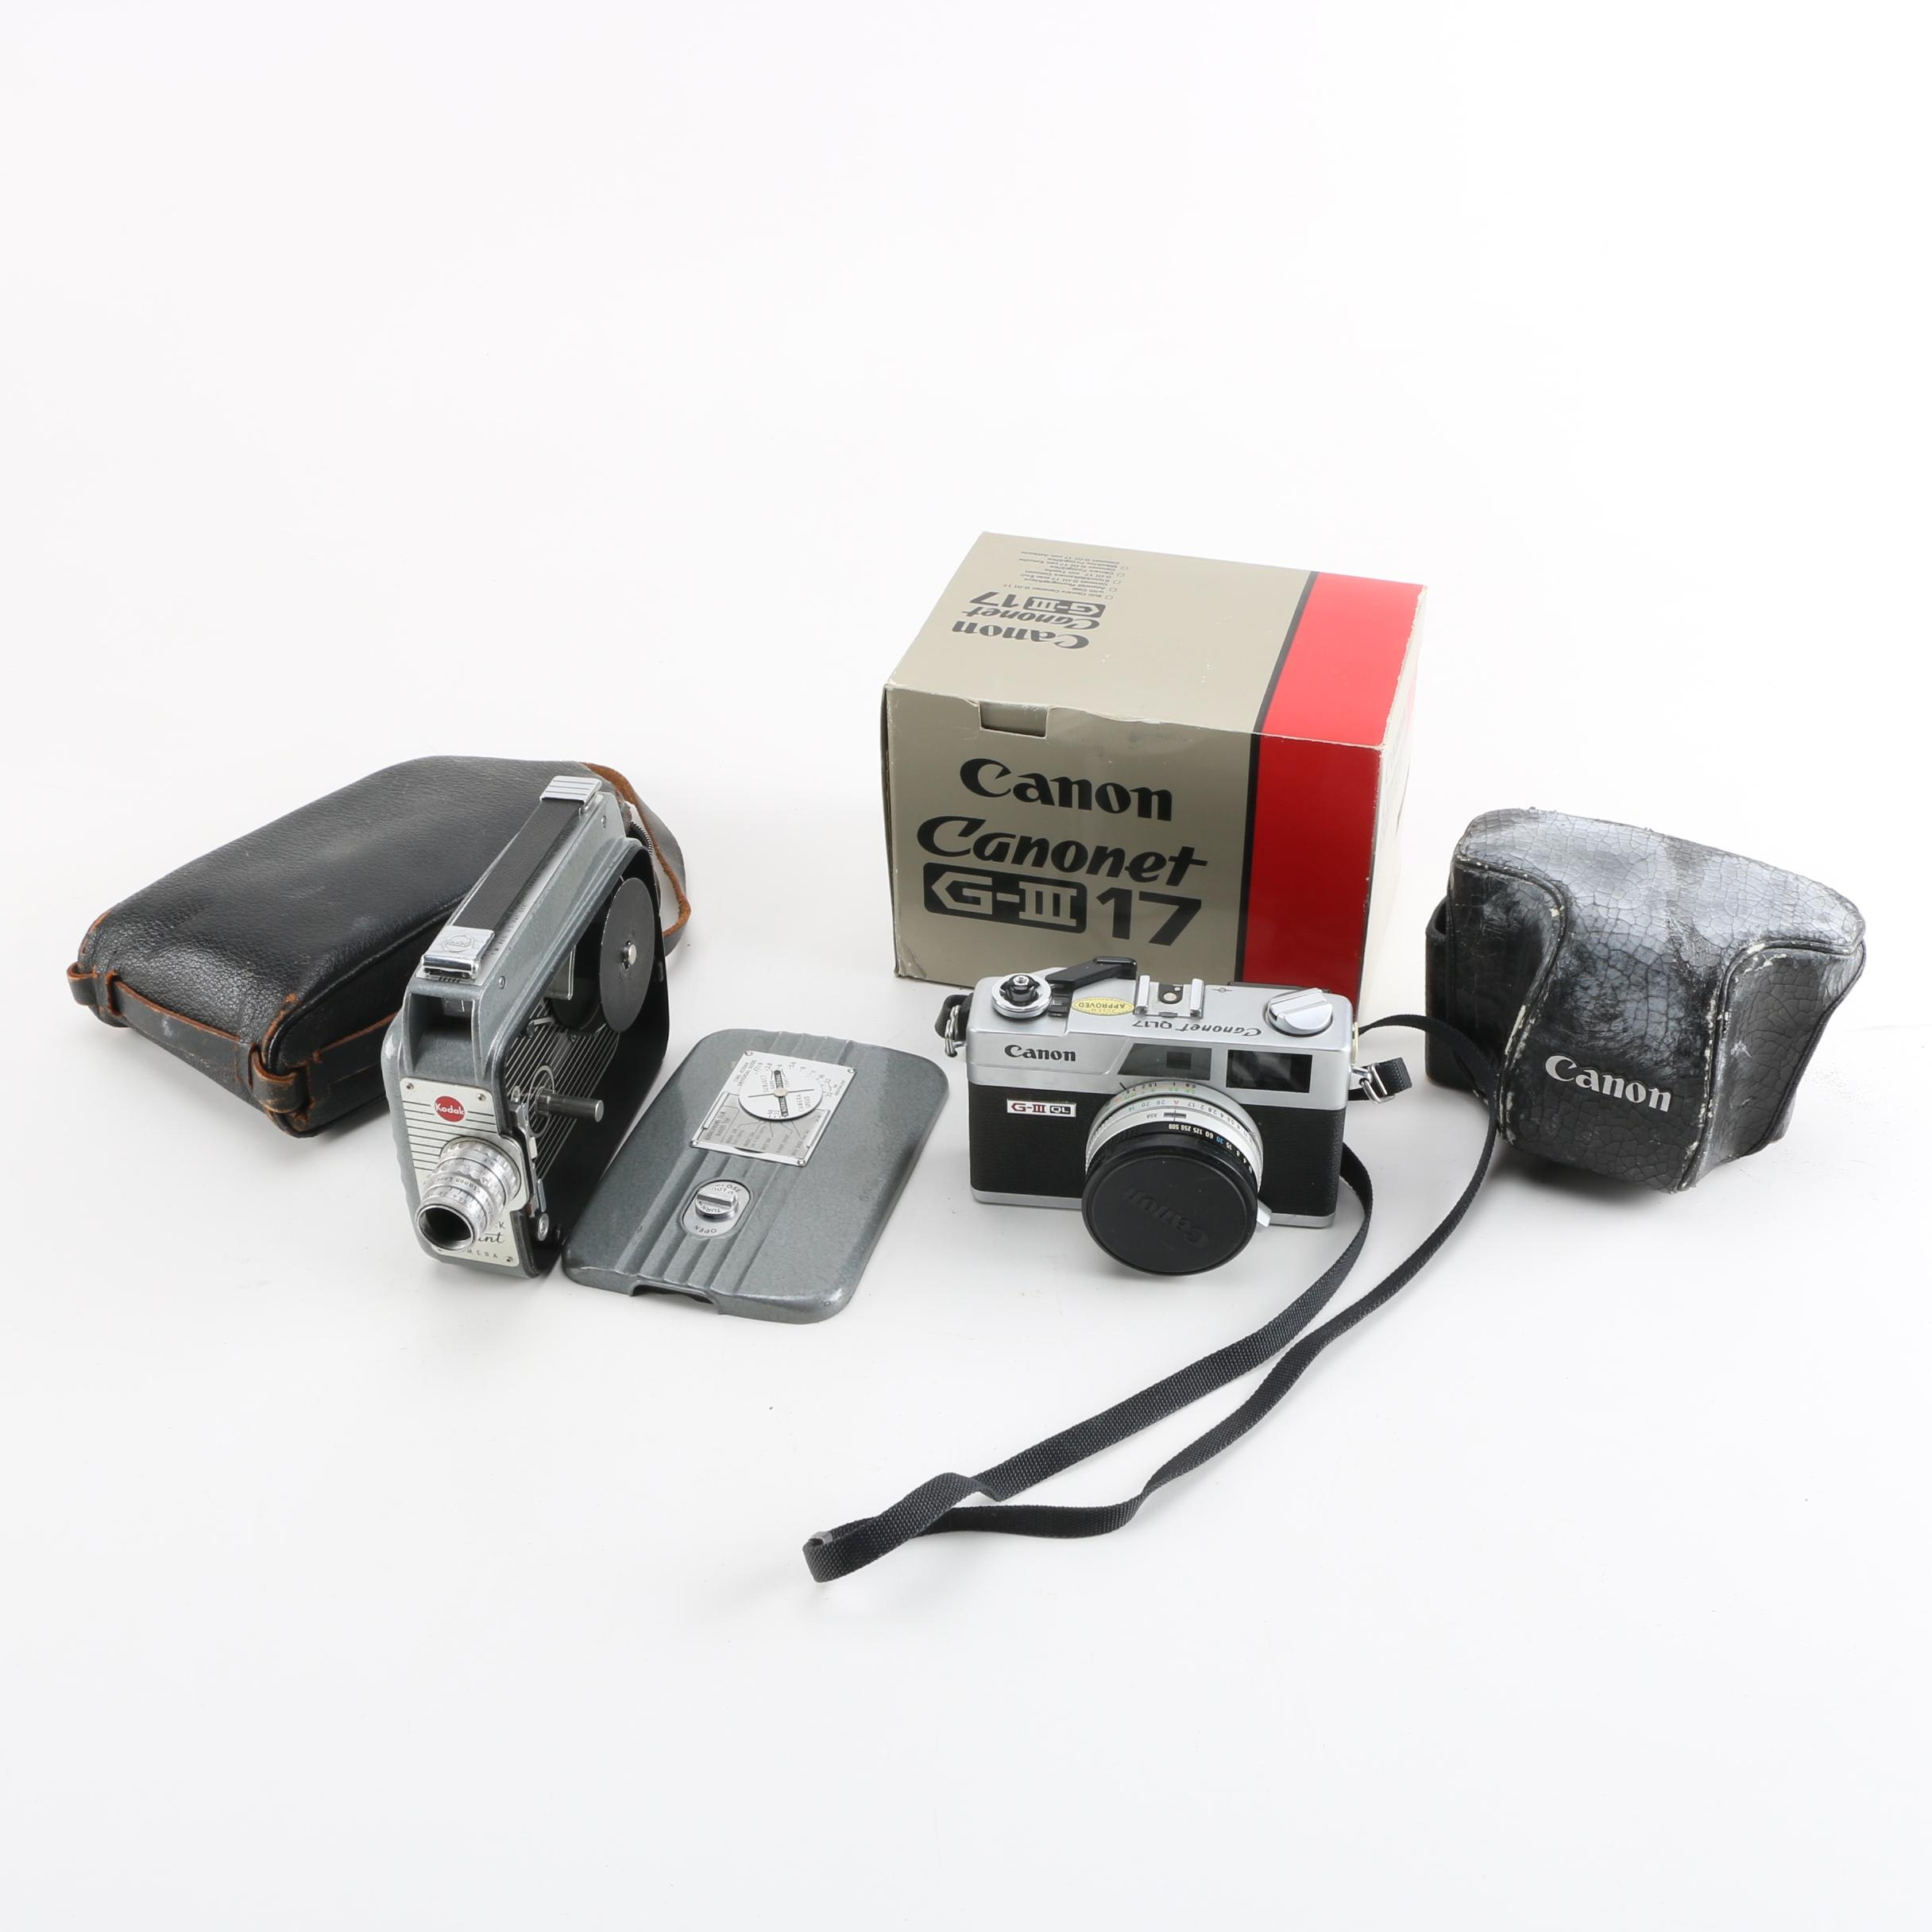 Vintage Kodak and Canon Cameras